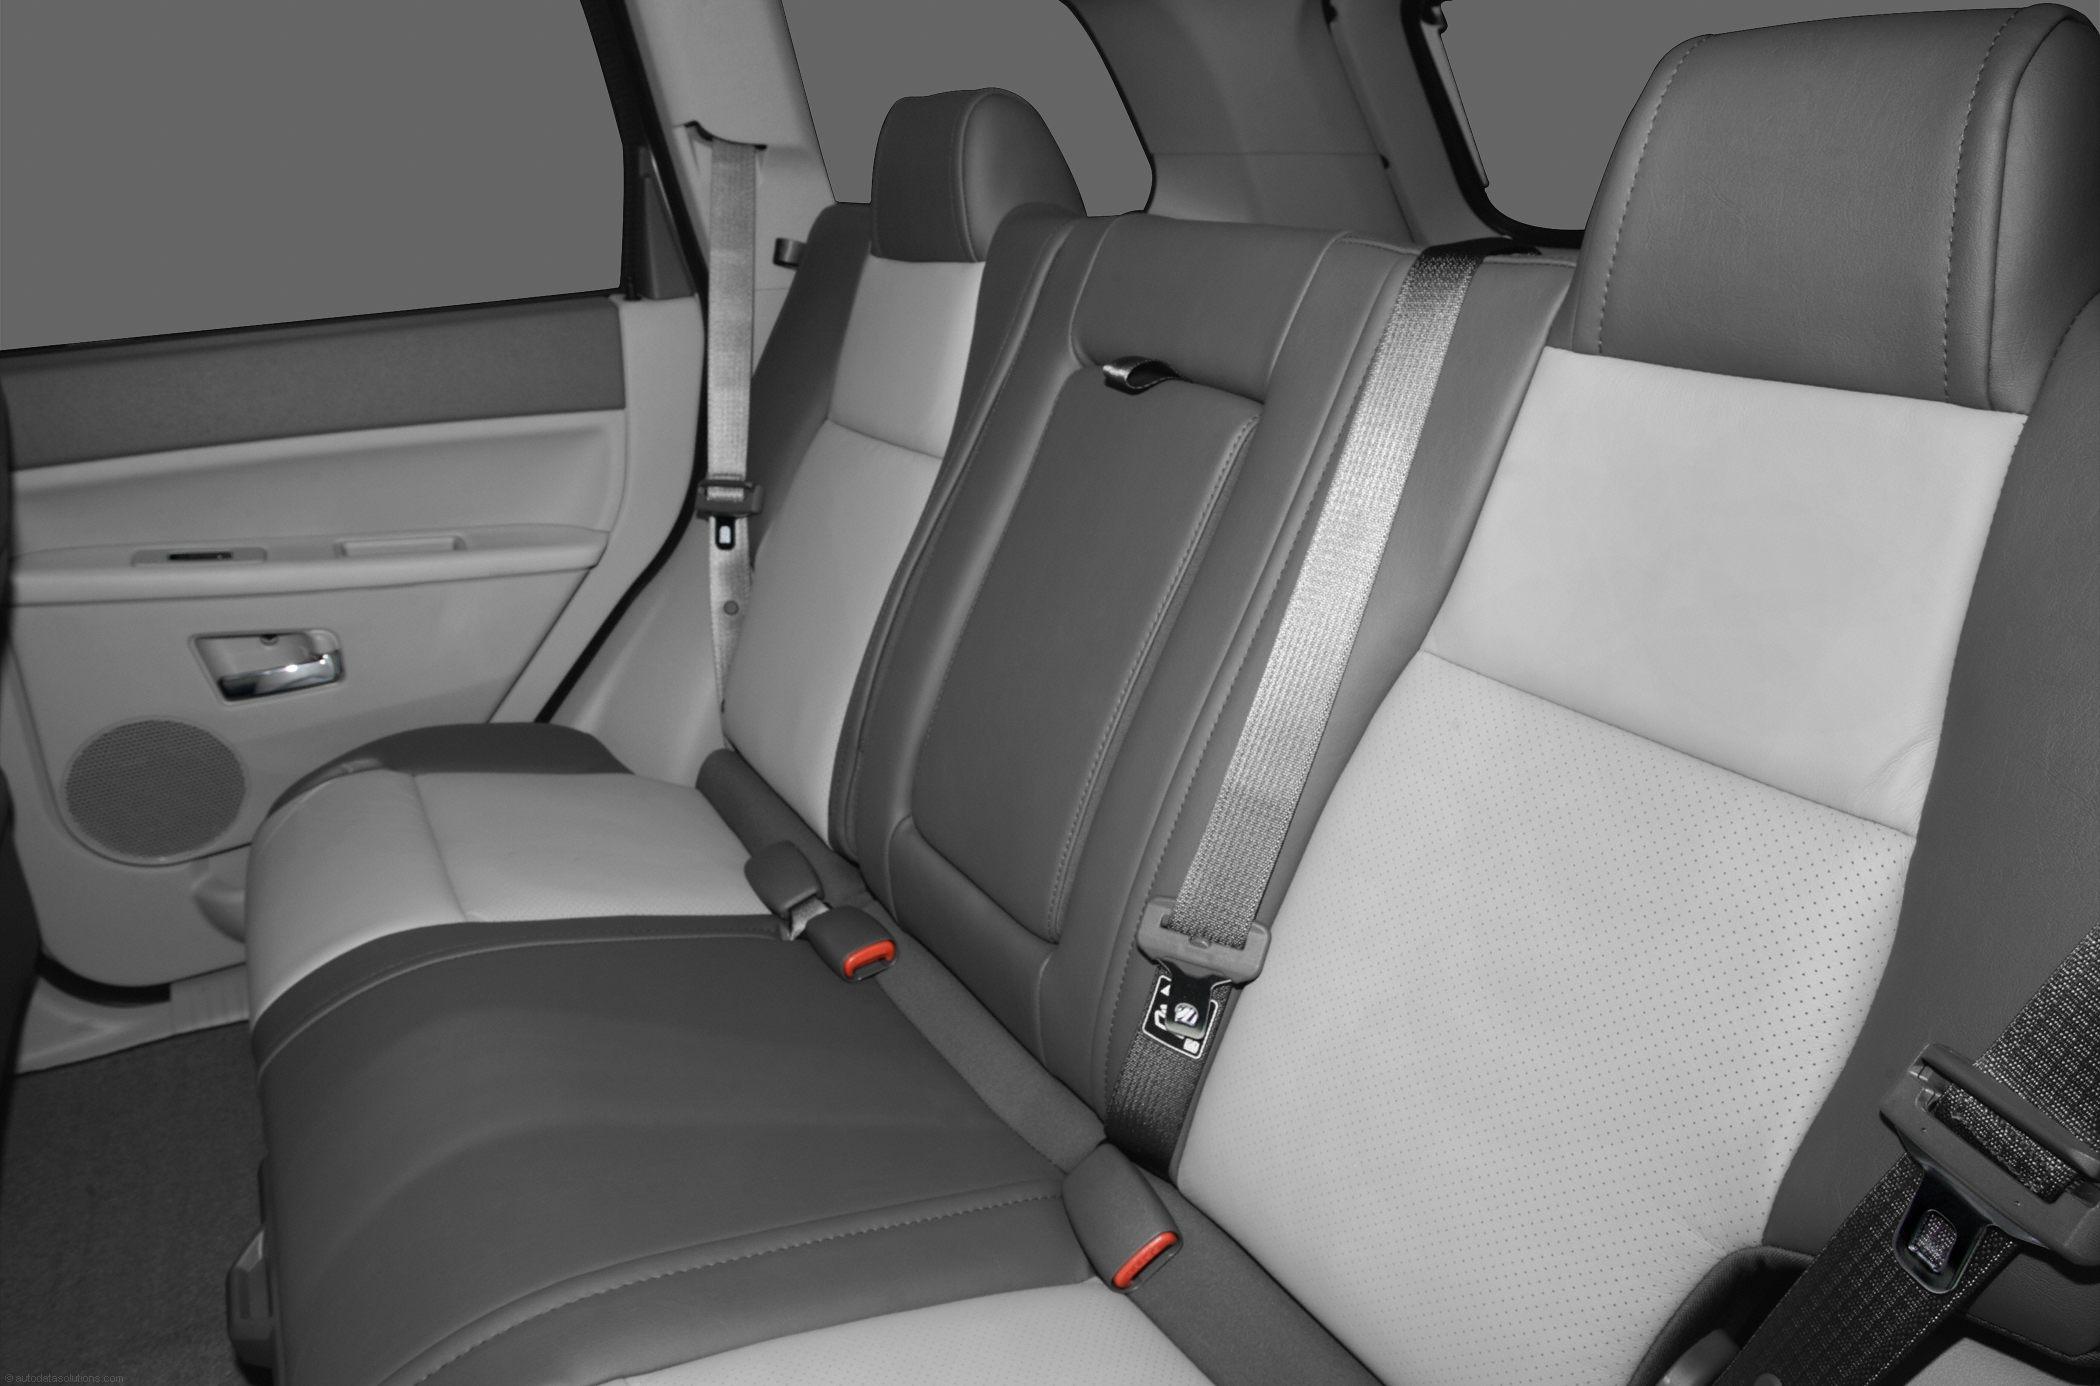 jeep grand cherokee invoice 2015 jeep grand cherokee laredo india price automotives cars 2100 X 1386